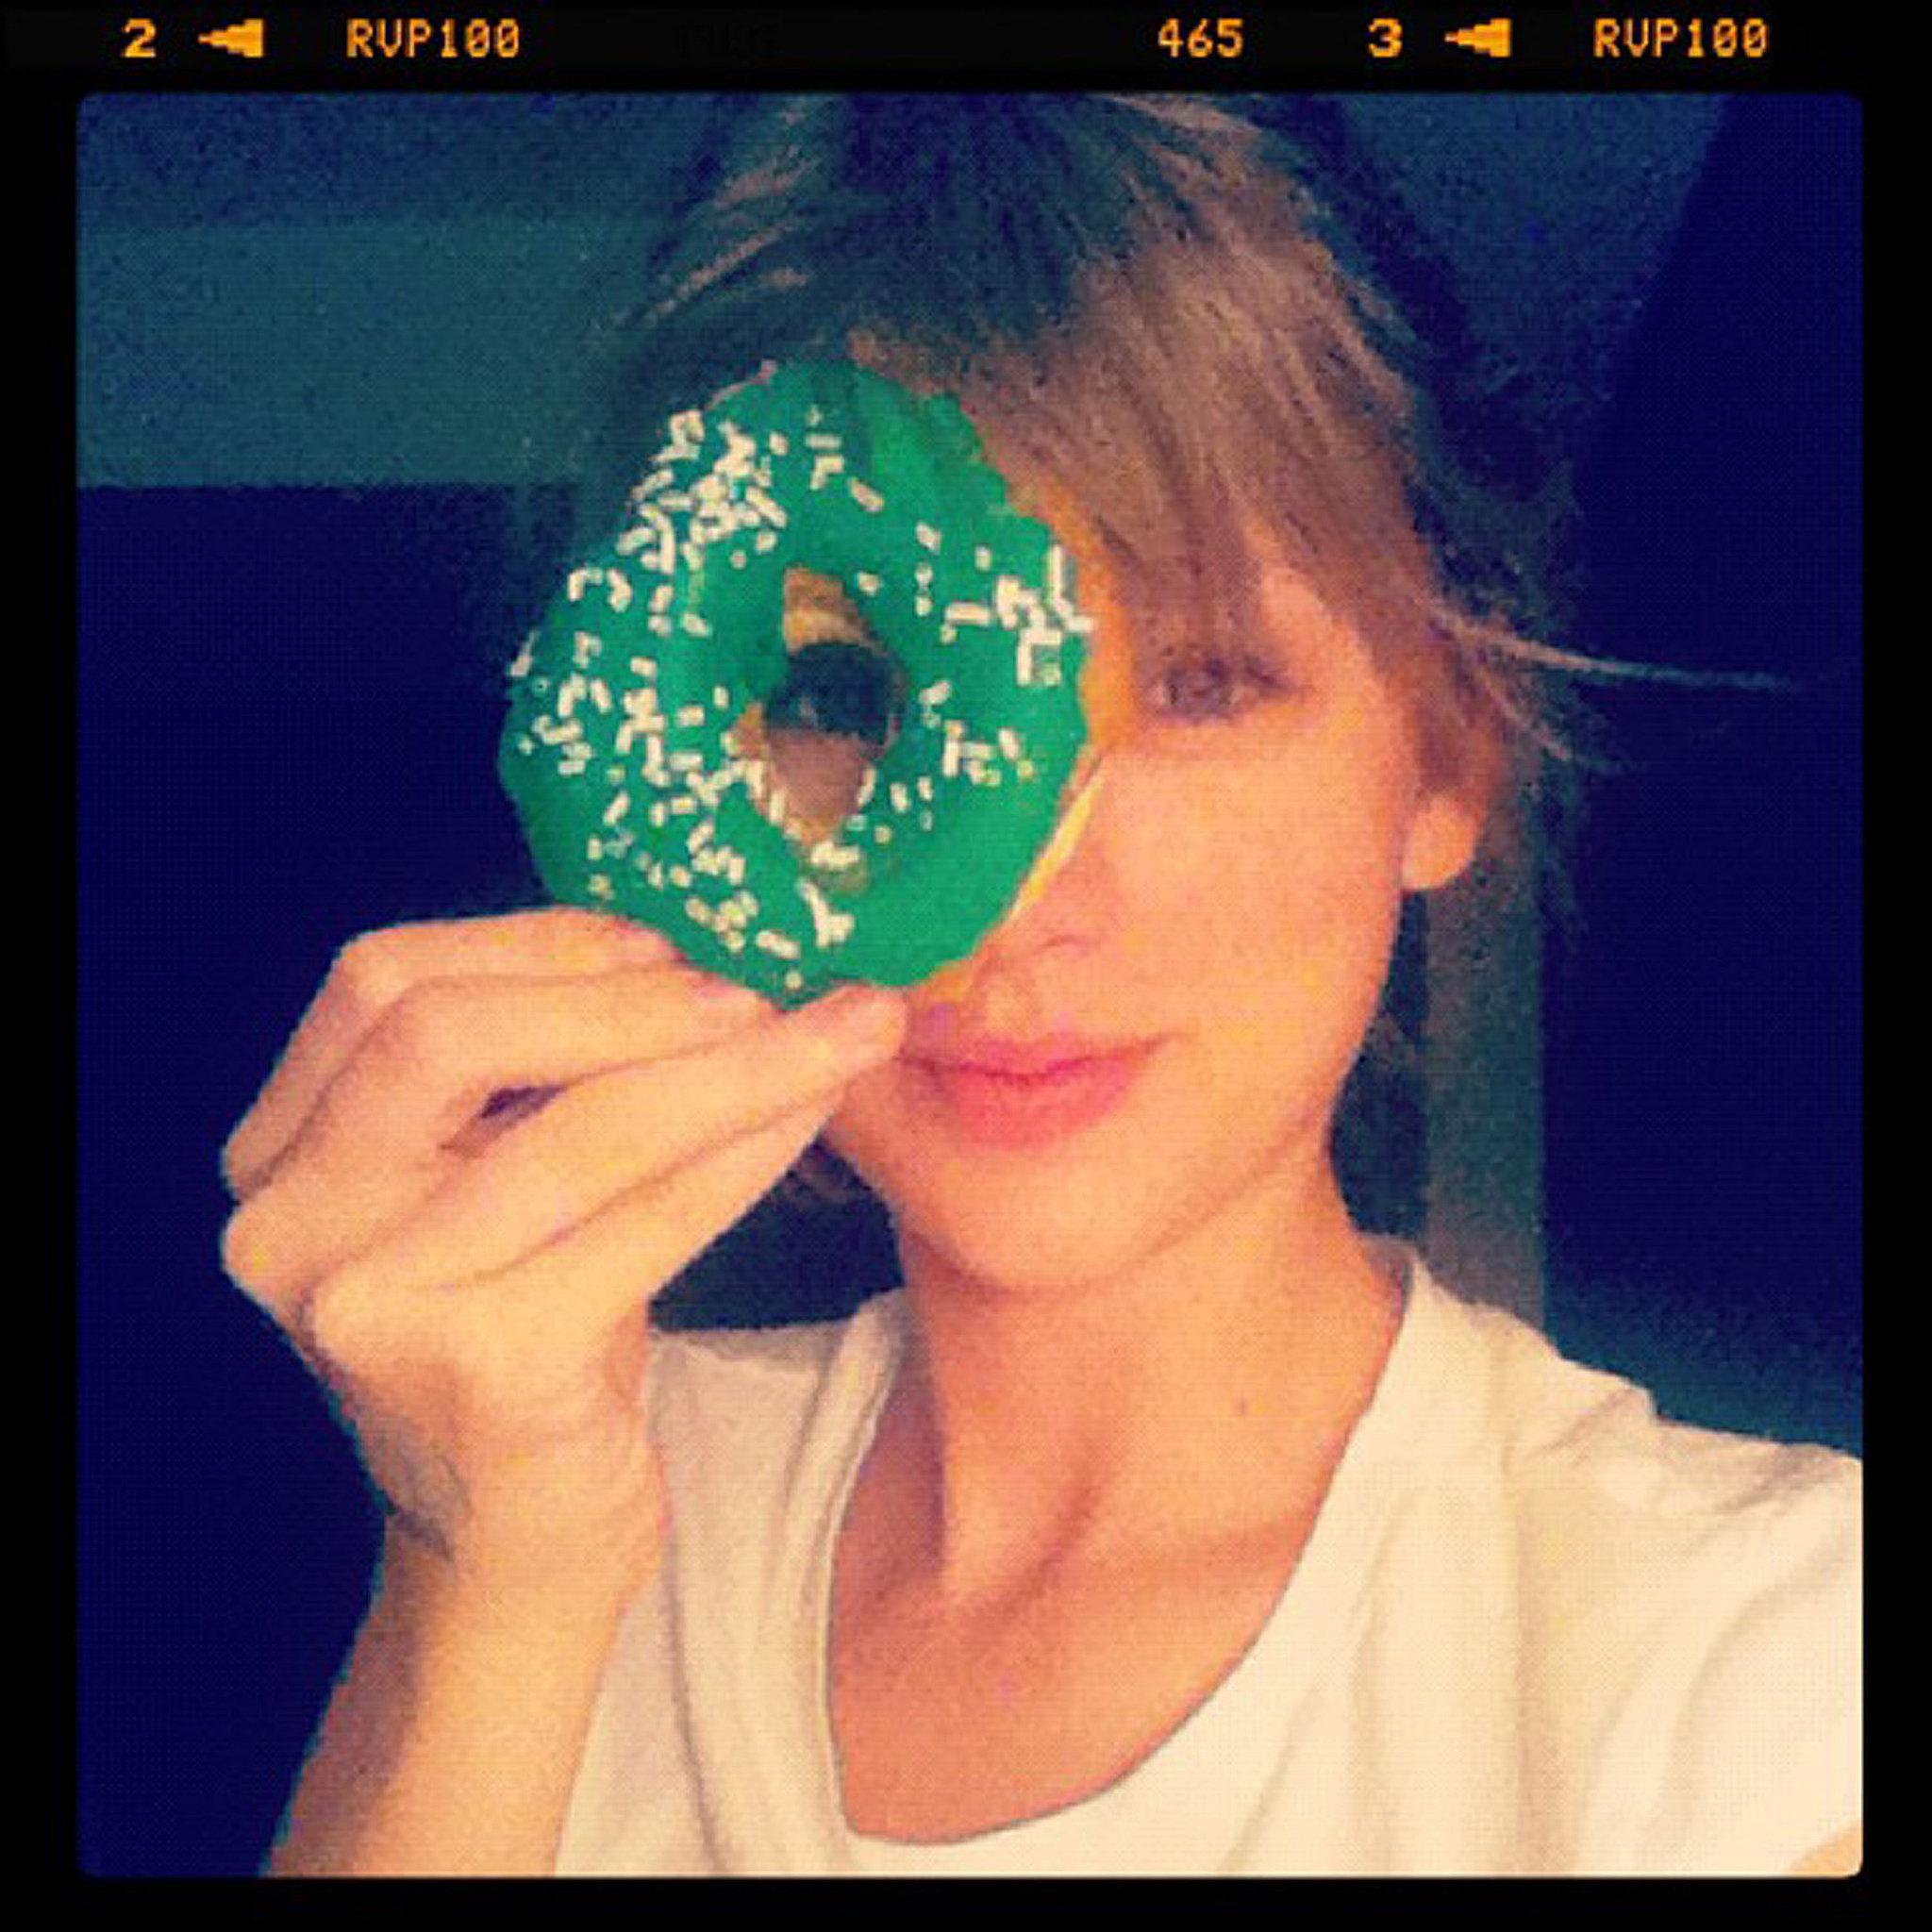 Taylor Swift spent St. Patrick's Day enjoying a festive March doughnut in 2012.  Source: Instagram user taylorswift